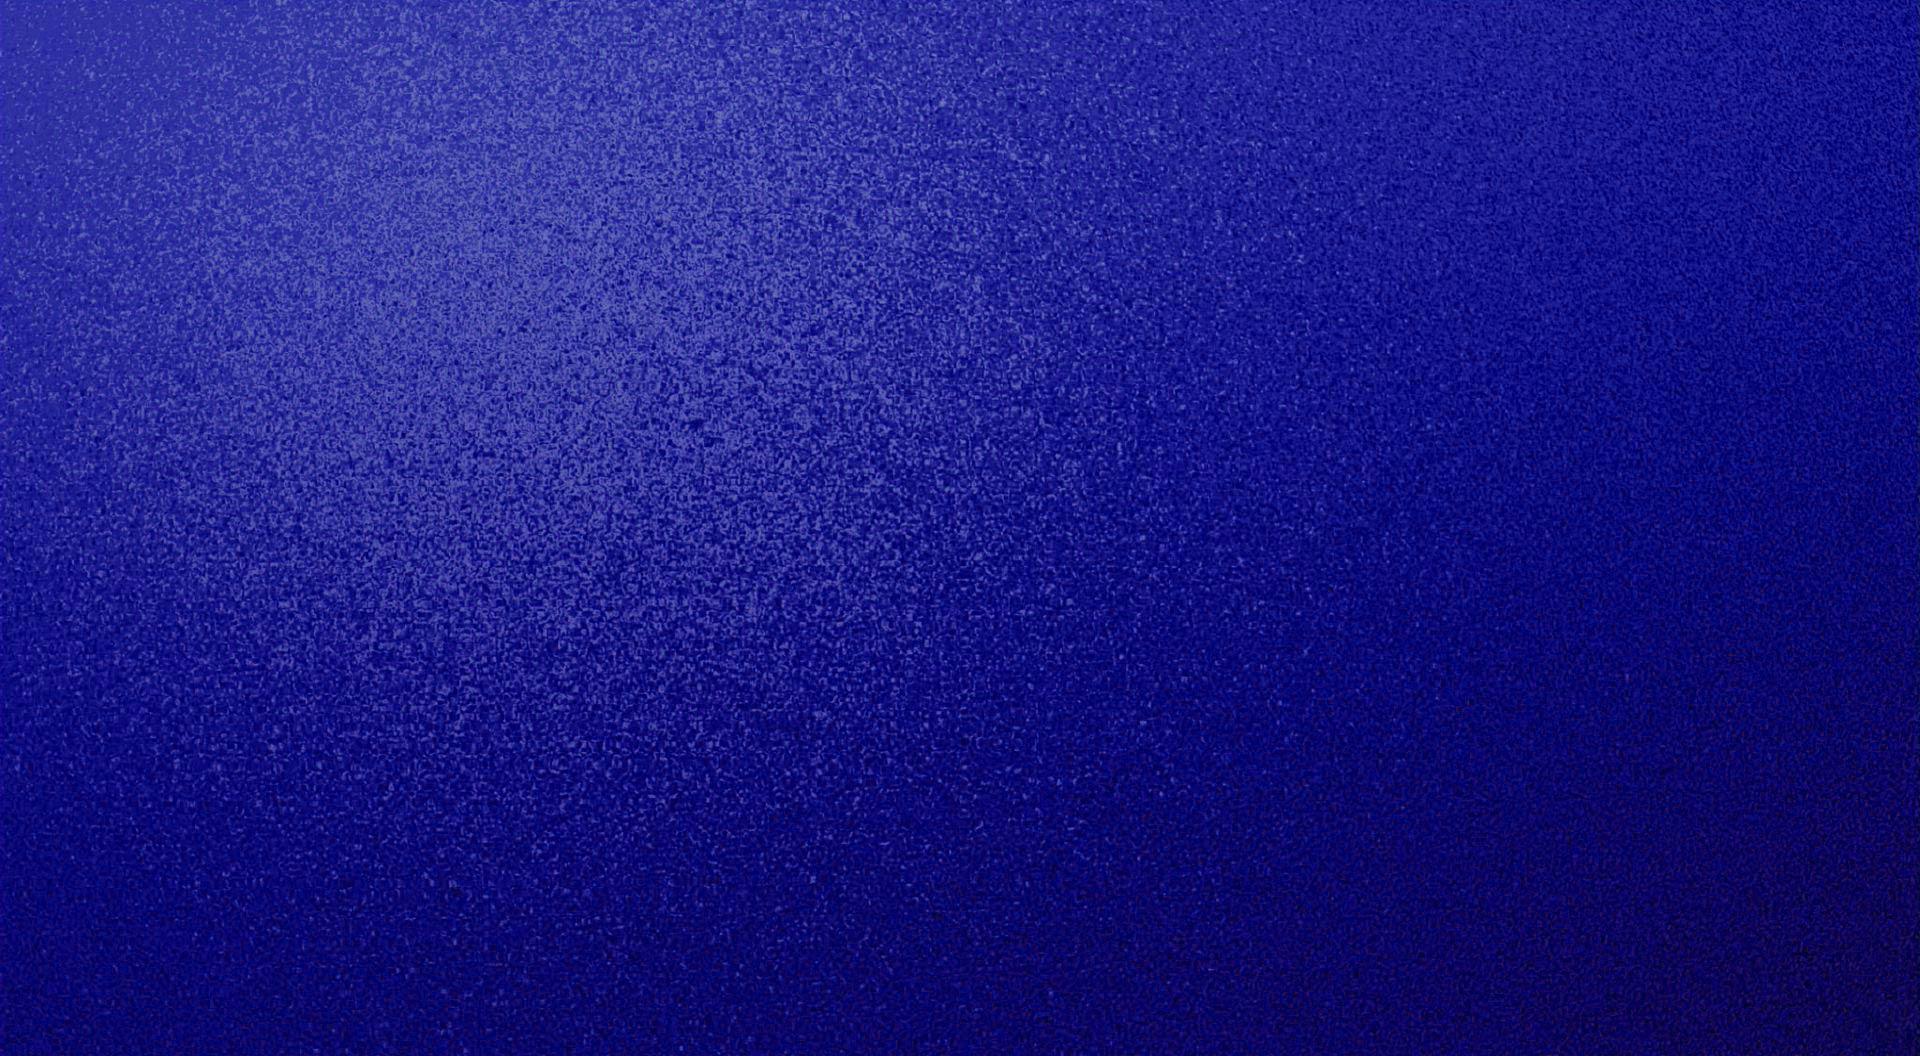 Dark blueroyal blue textured speckled desktop background wallpaper 1920x1056